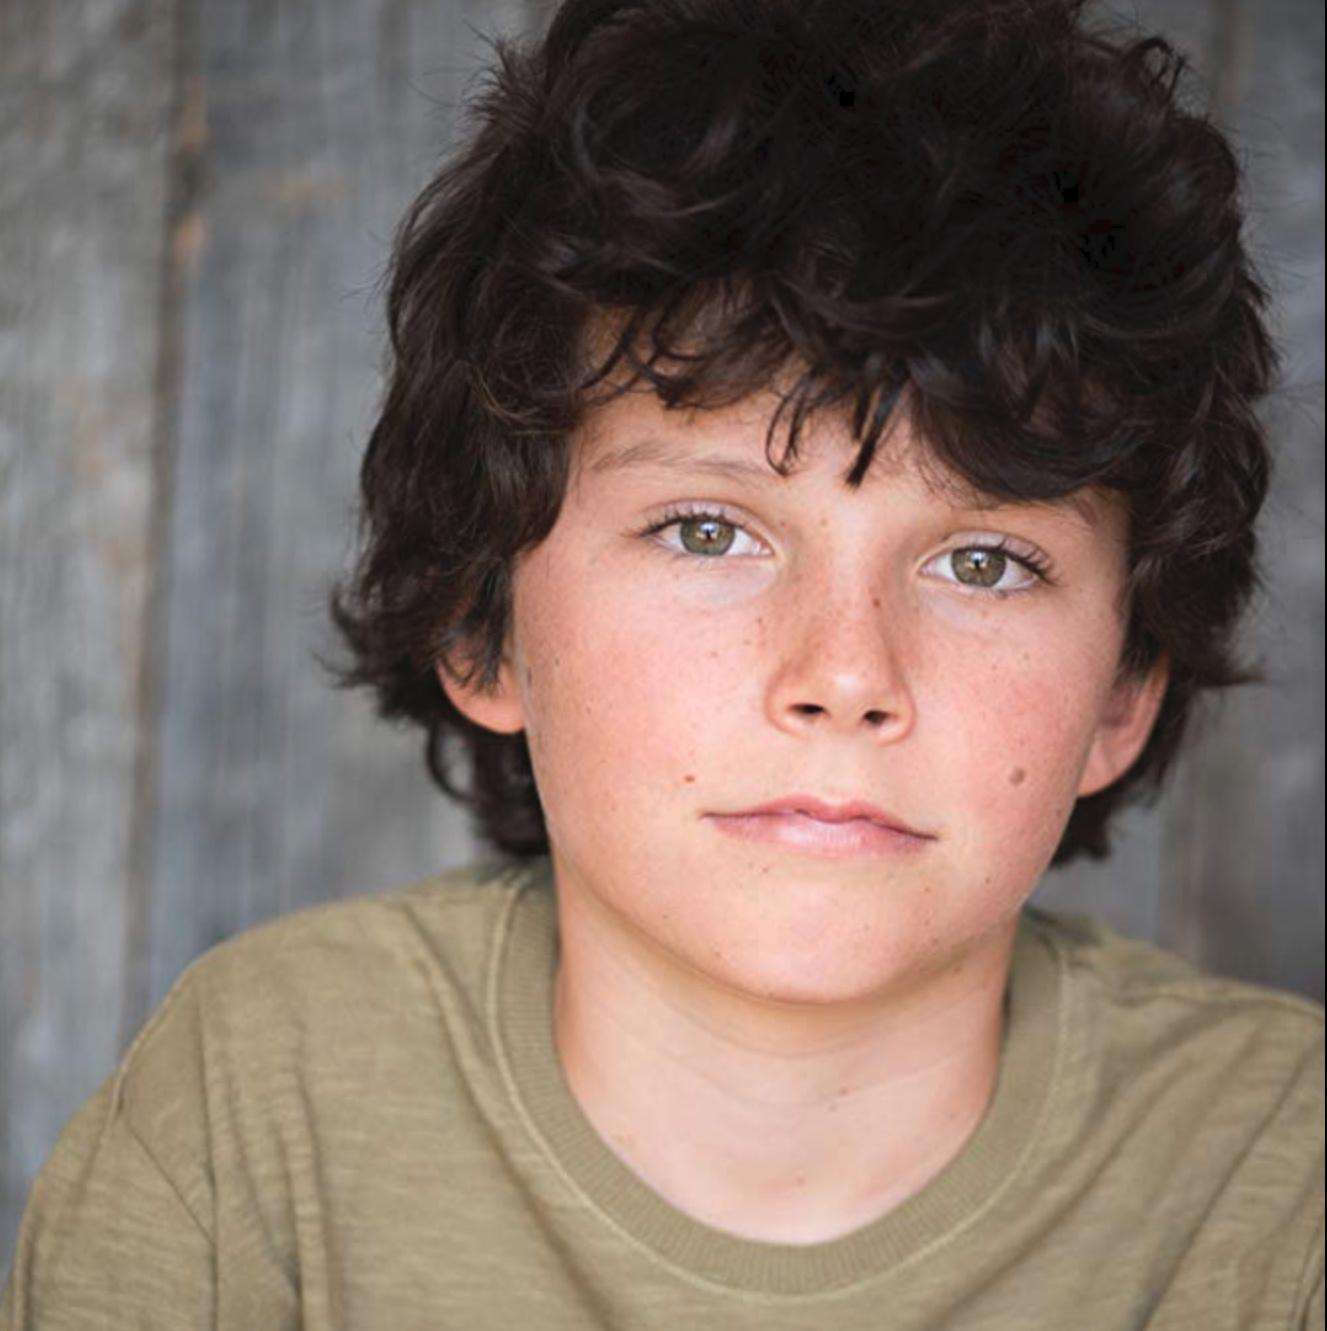 Nicolas Schilling Lead Actor - Connect with Nicolas on IMDB.